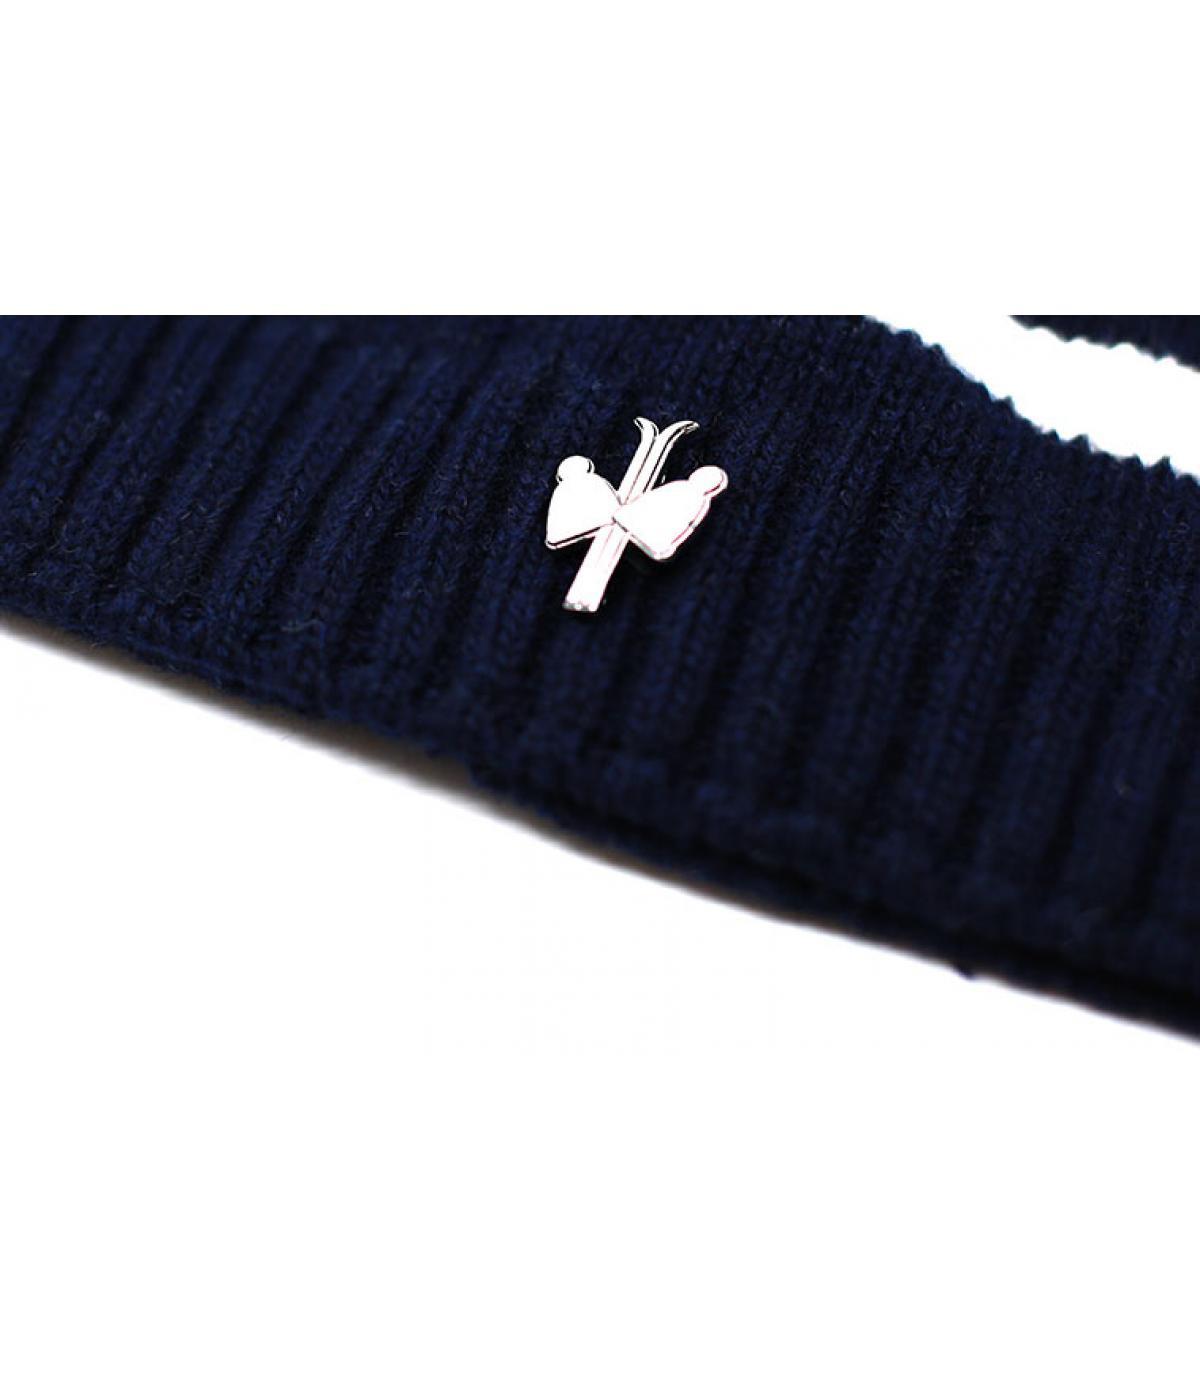 Détails Boscano navy - image 3